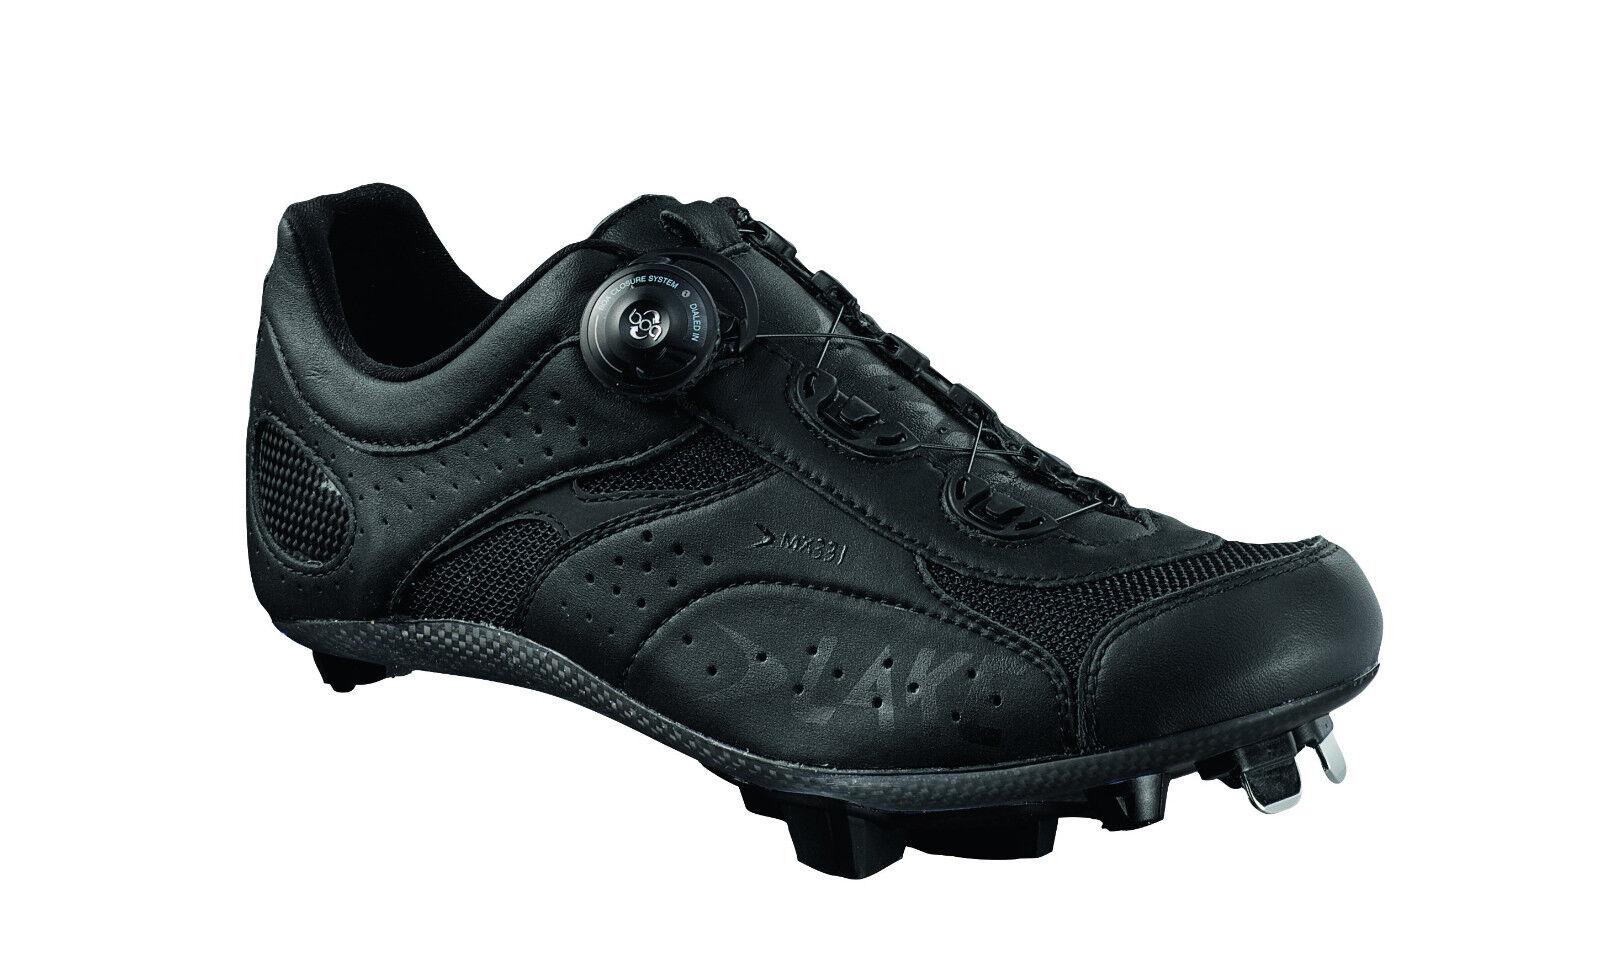 Lake MX 331 spd click-bicicleta zapatos con boa-cierre-nuevo-VK  359,90 euros